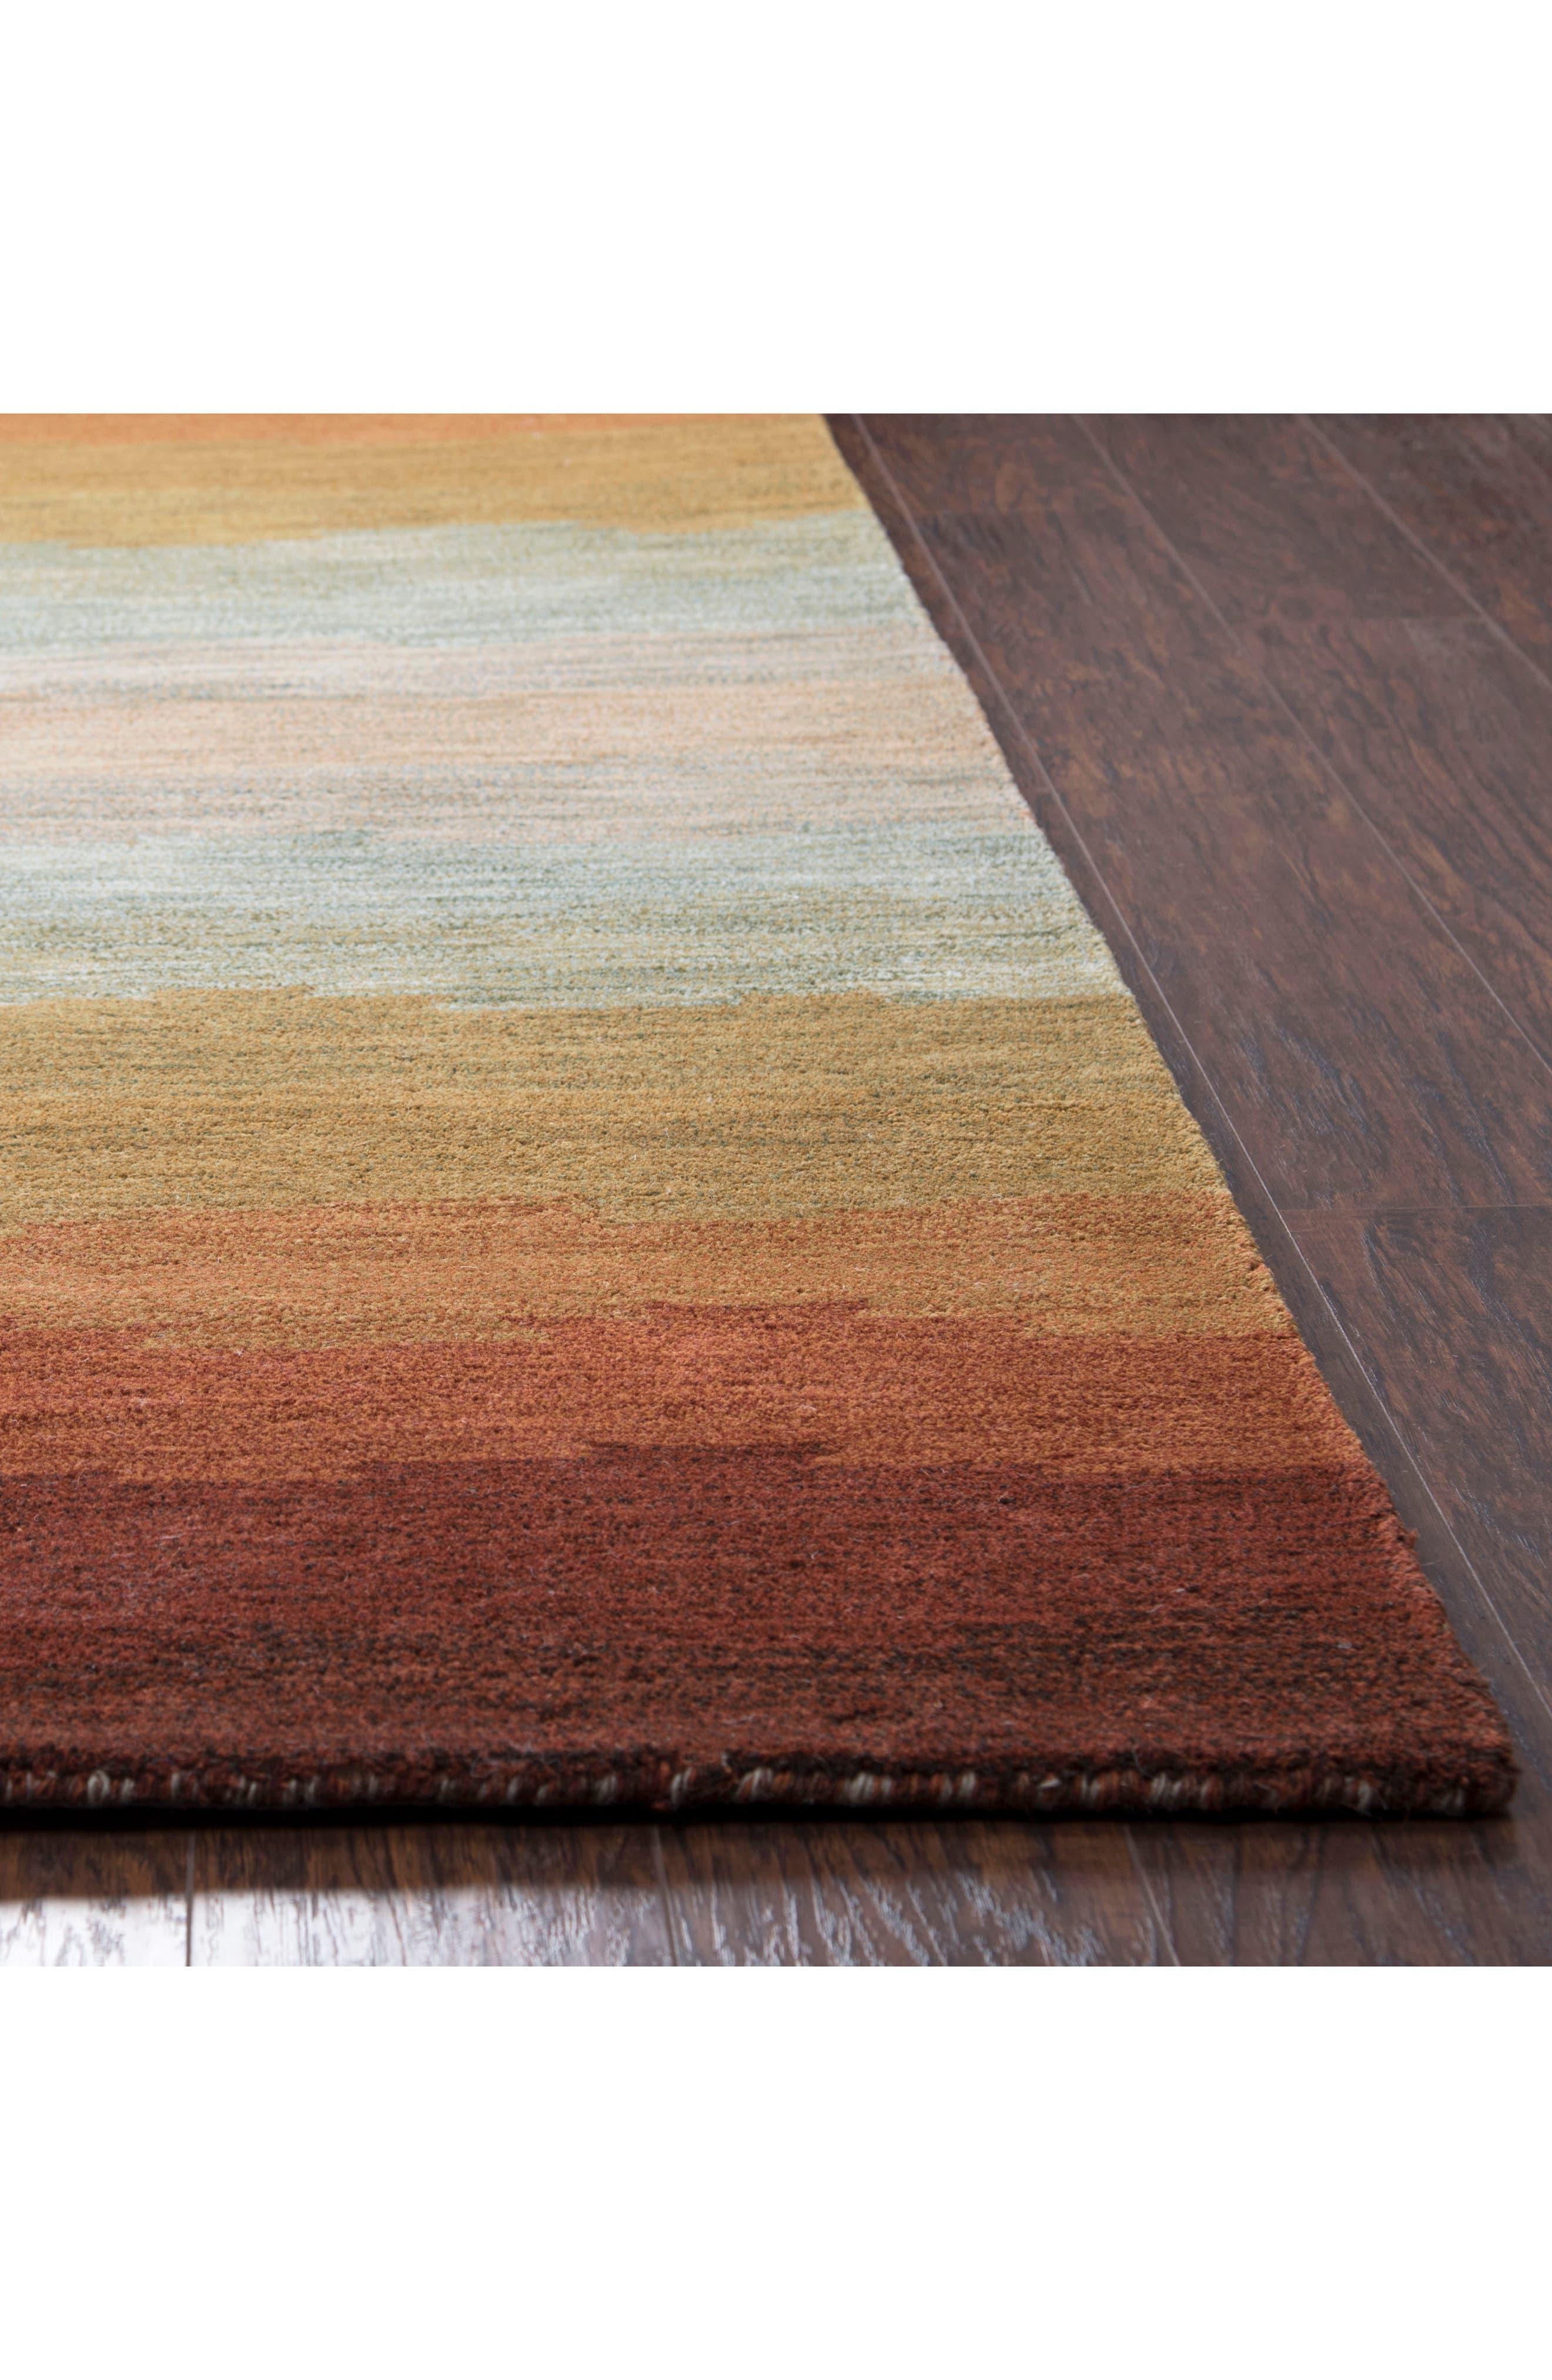 Desert Oasis Hand Tufted Wool Area Rug,                             Alternate thumbnail 3, color,                             220